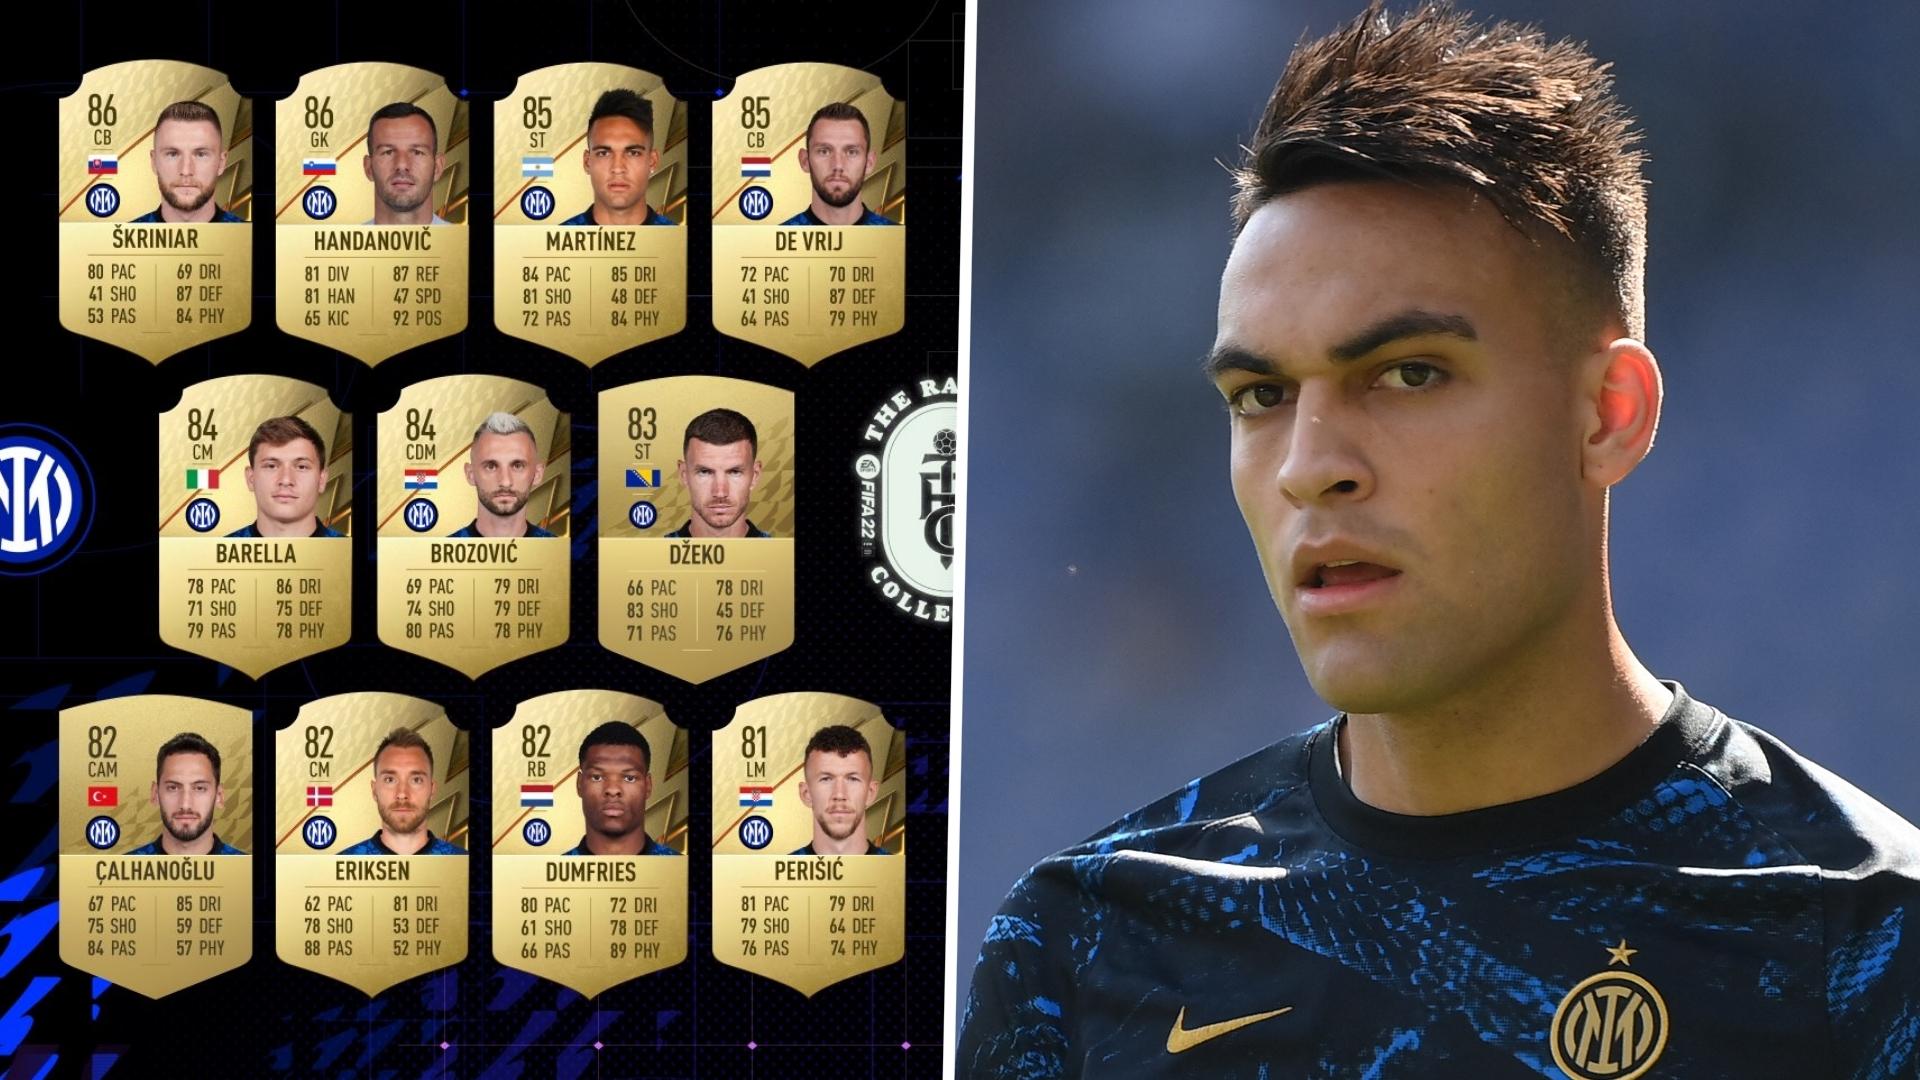 FIFA 22 ratings: Handanovic, Martinez & Inter's best players revealed